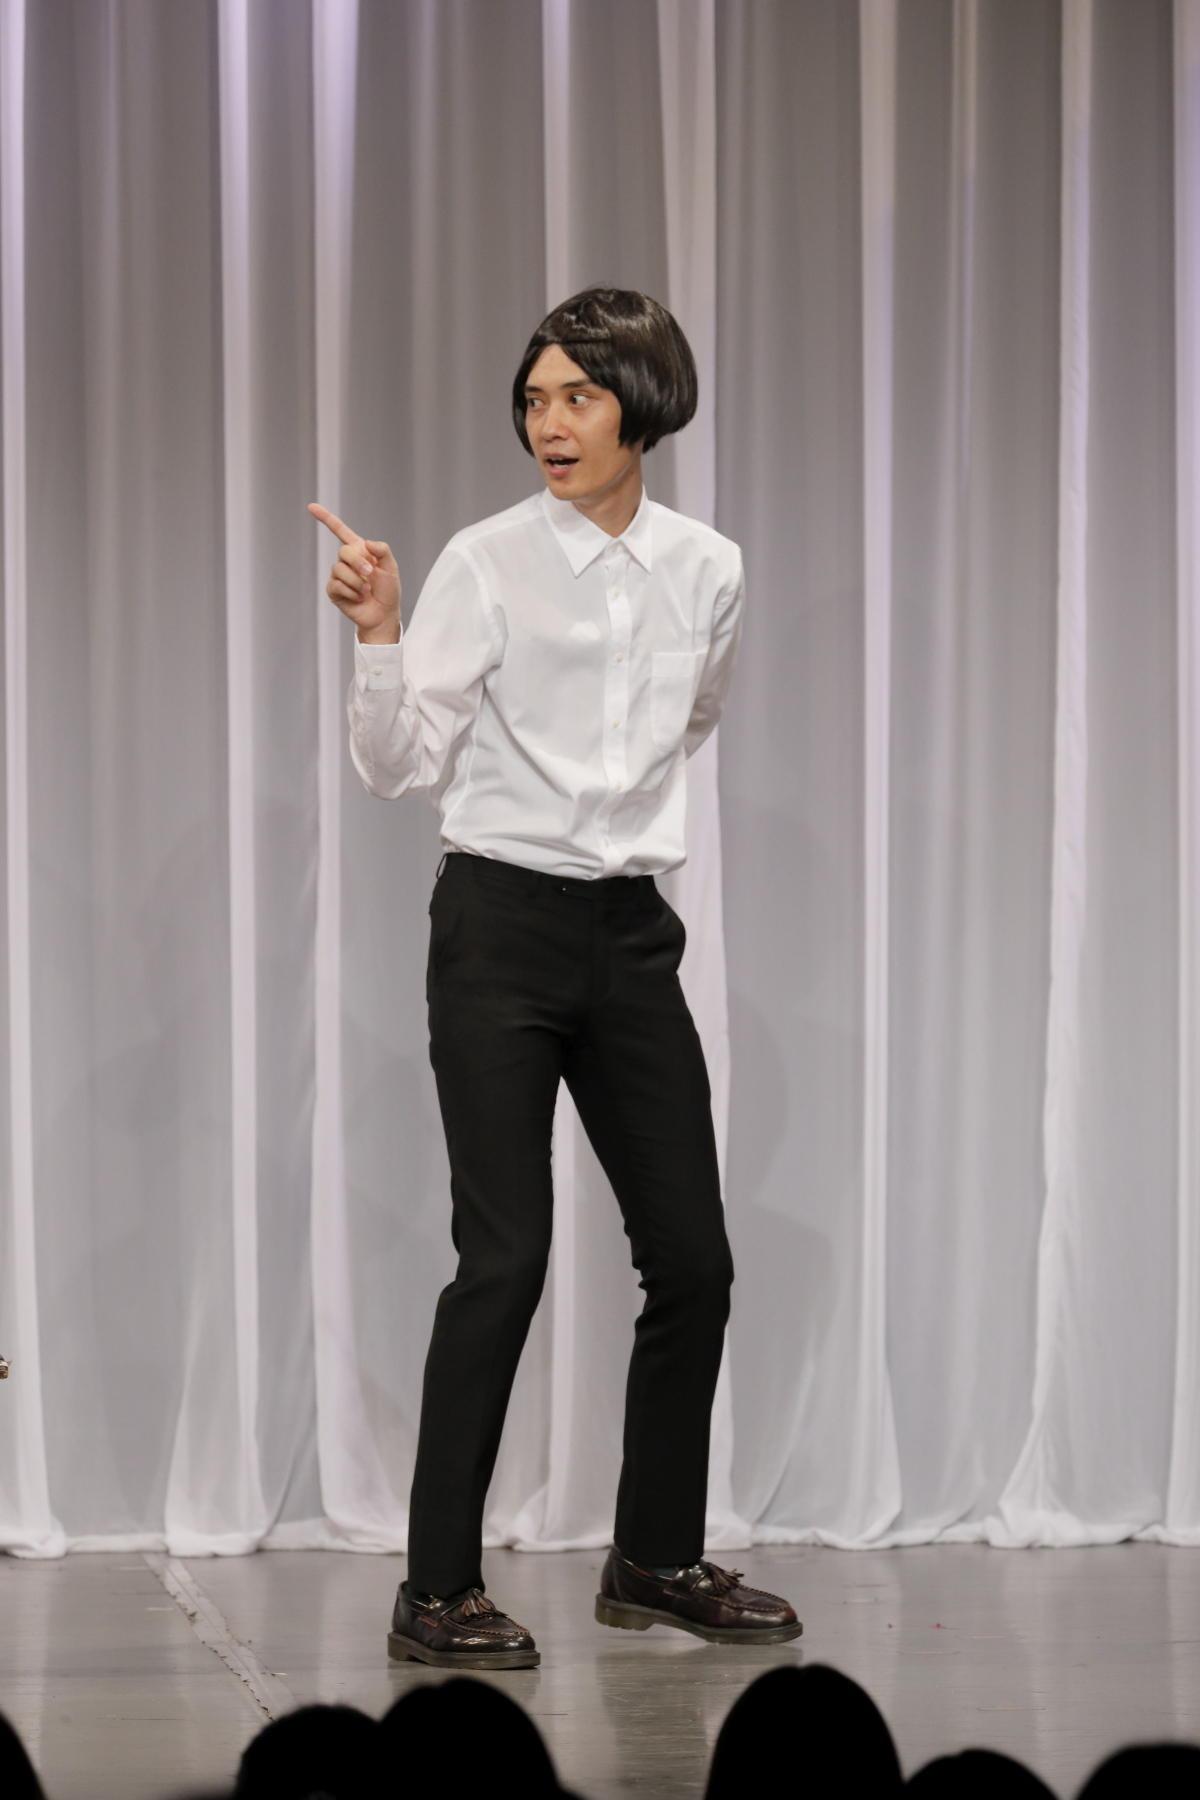 http://news.yoshimoto.co.jp/20181204222933-ddbbaa7cae582c22ea4fe07c72b809d3c16b39bd.jpg